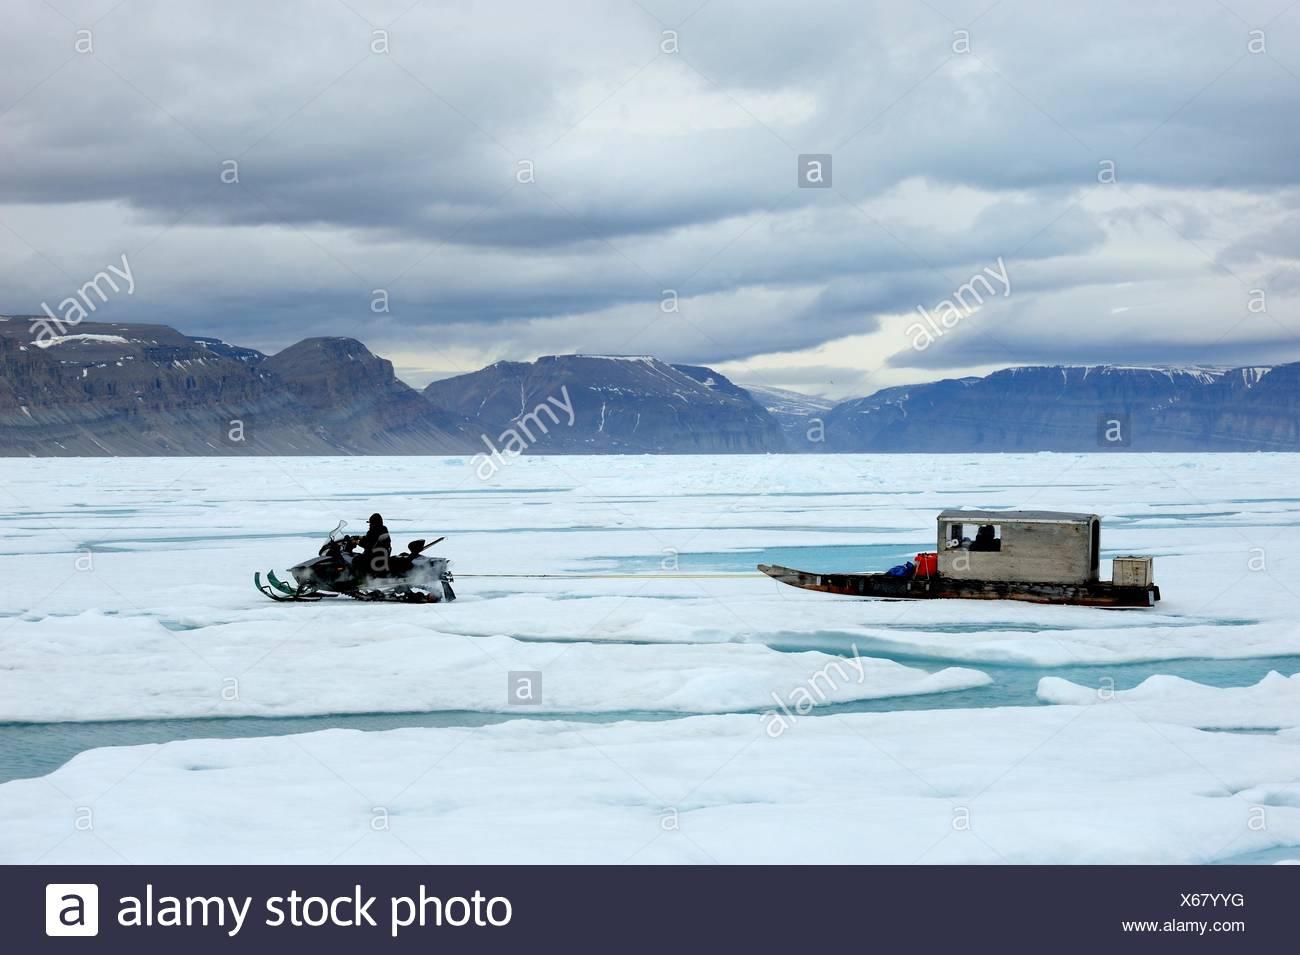 Inuit hunter driving snowmobile with Qamutik Inuit sledge on icepack, Arctic Bay, Baffin Island, Nunavut, Canada - Stock Image